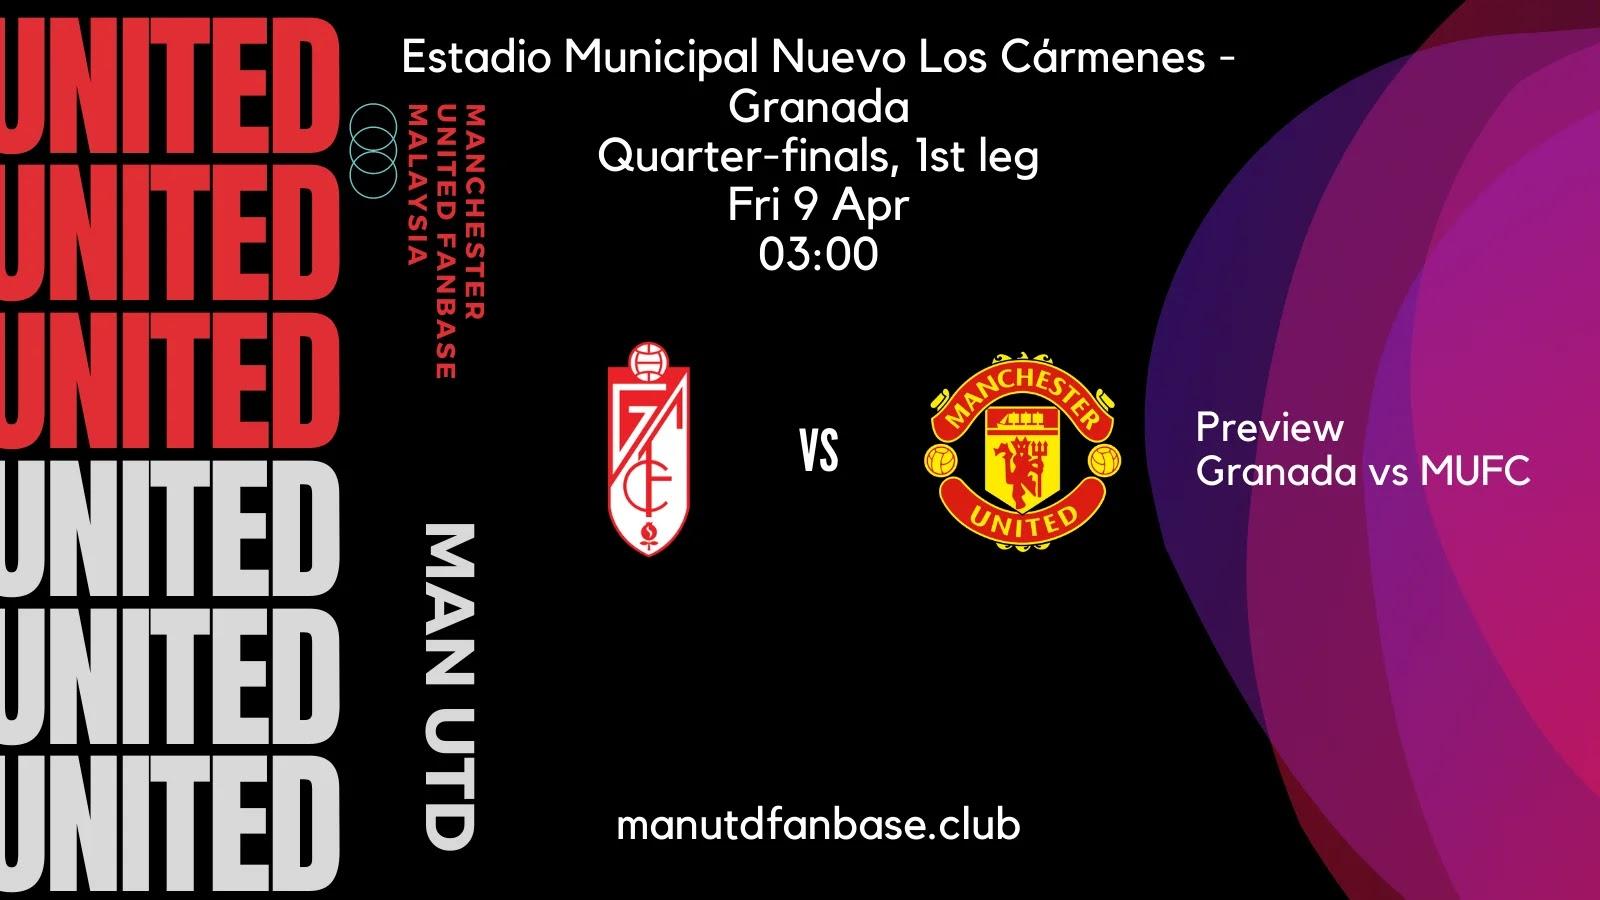 Preview Granada Lawan Manchester United UEL